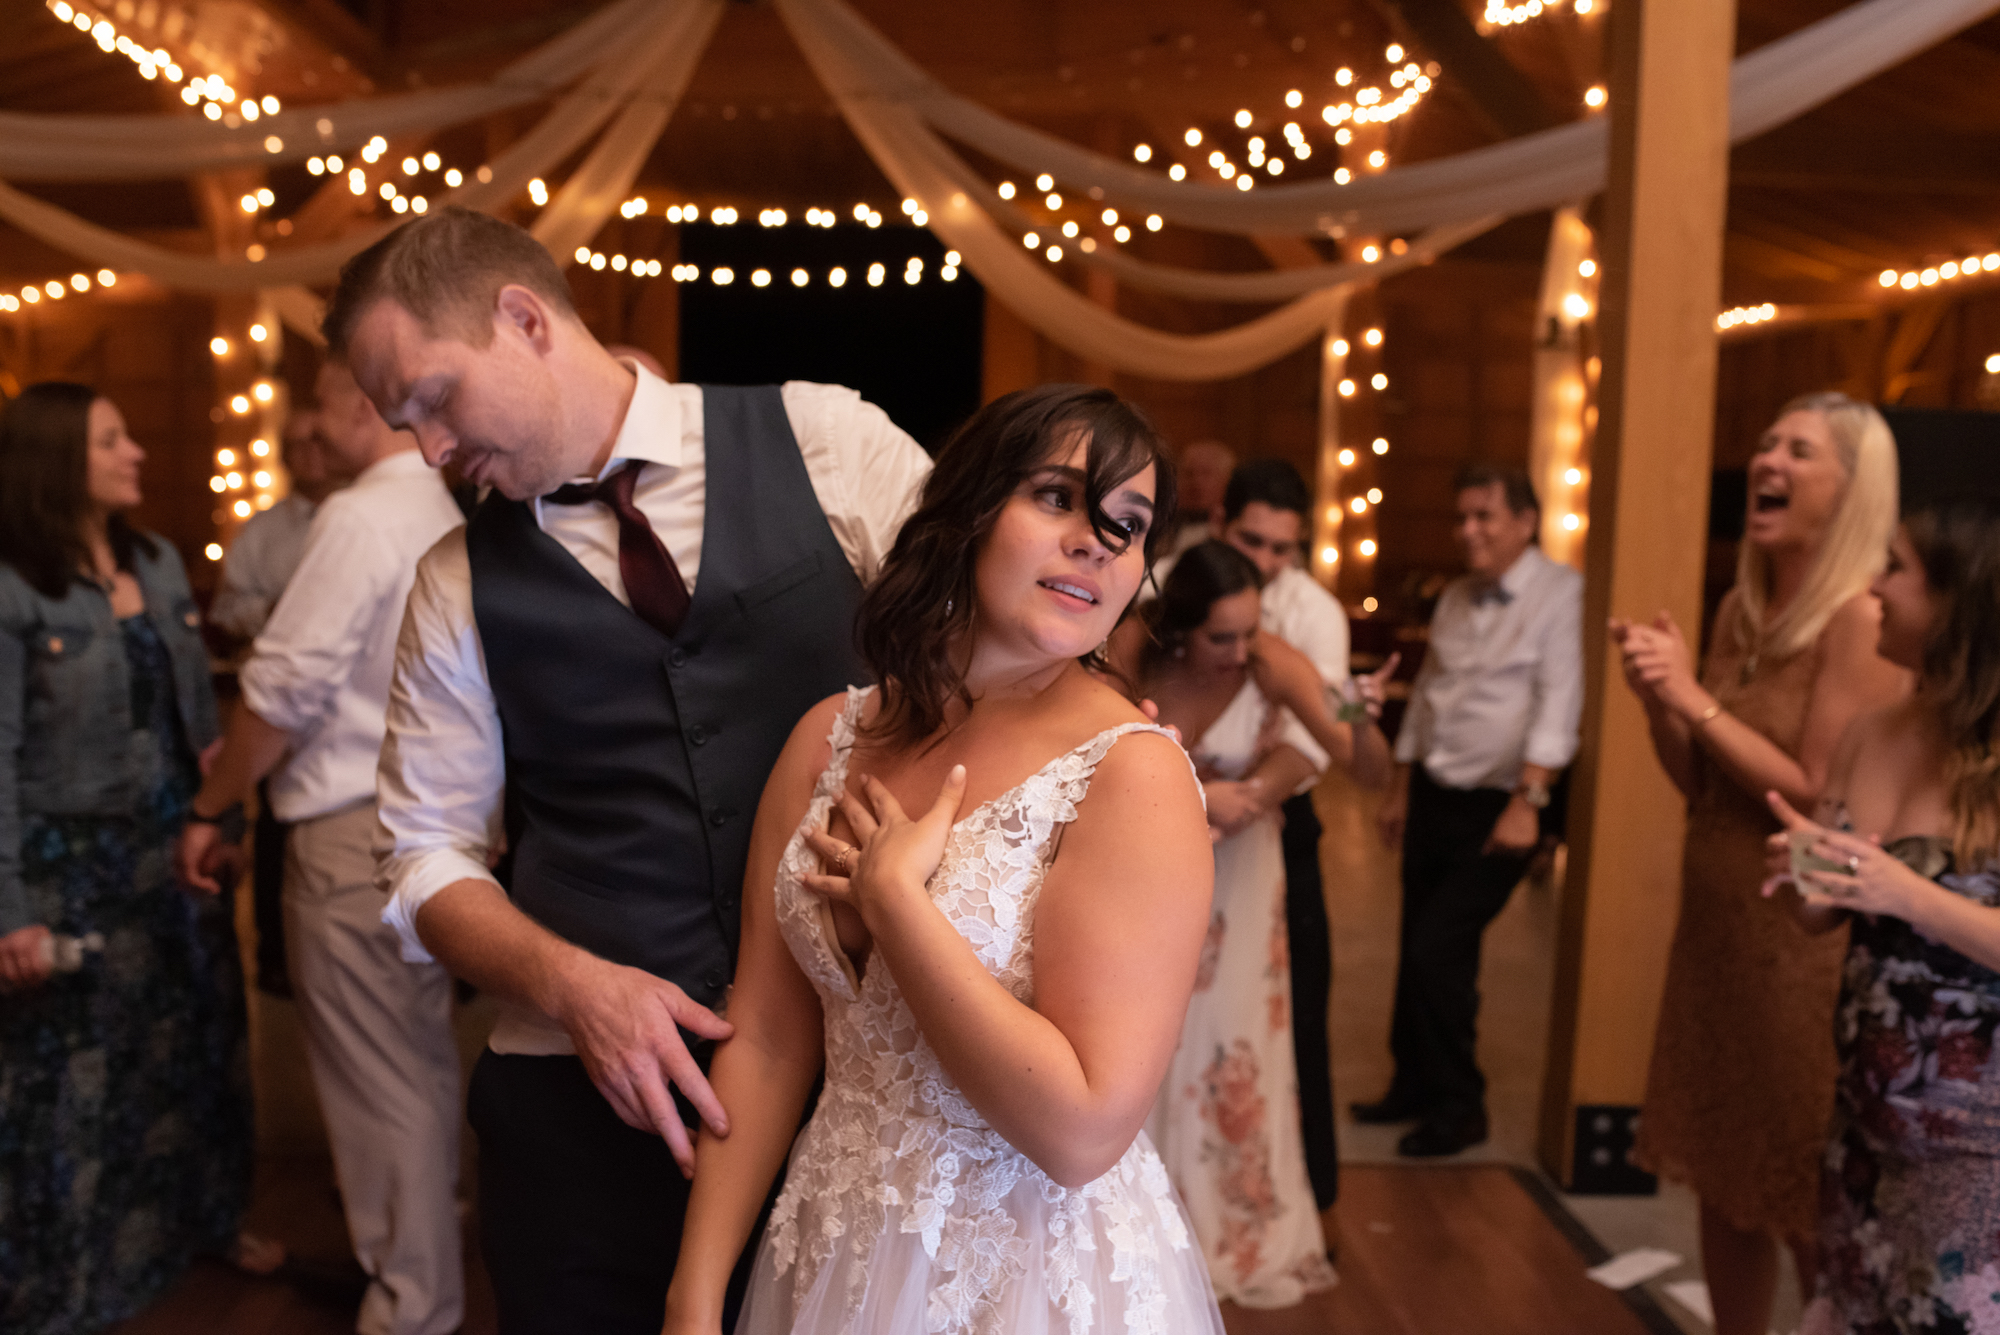 st-augustine-photographers-st-augustine-wedding-photographer-sarah-annay6.jpg